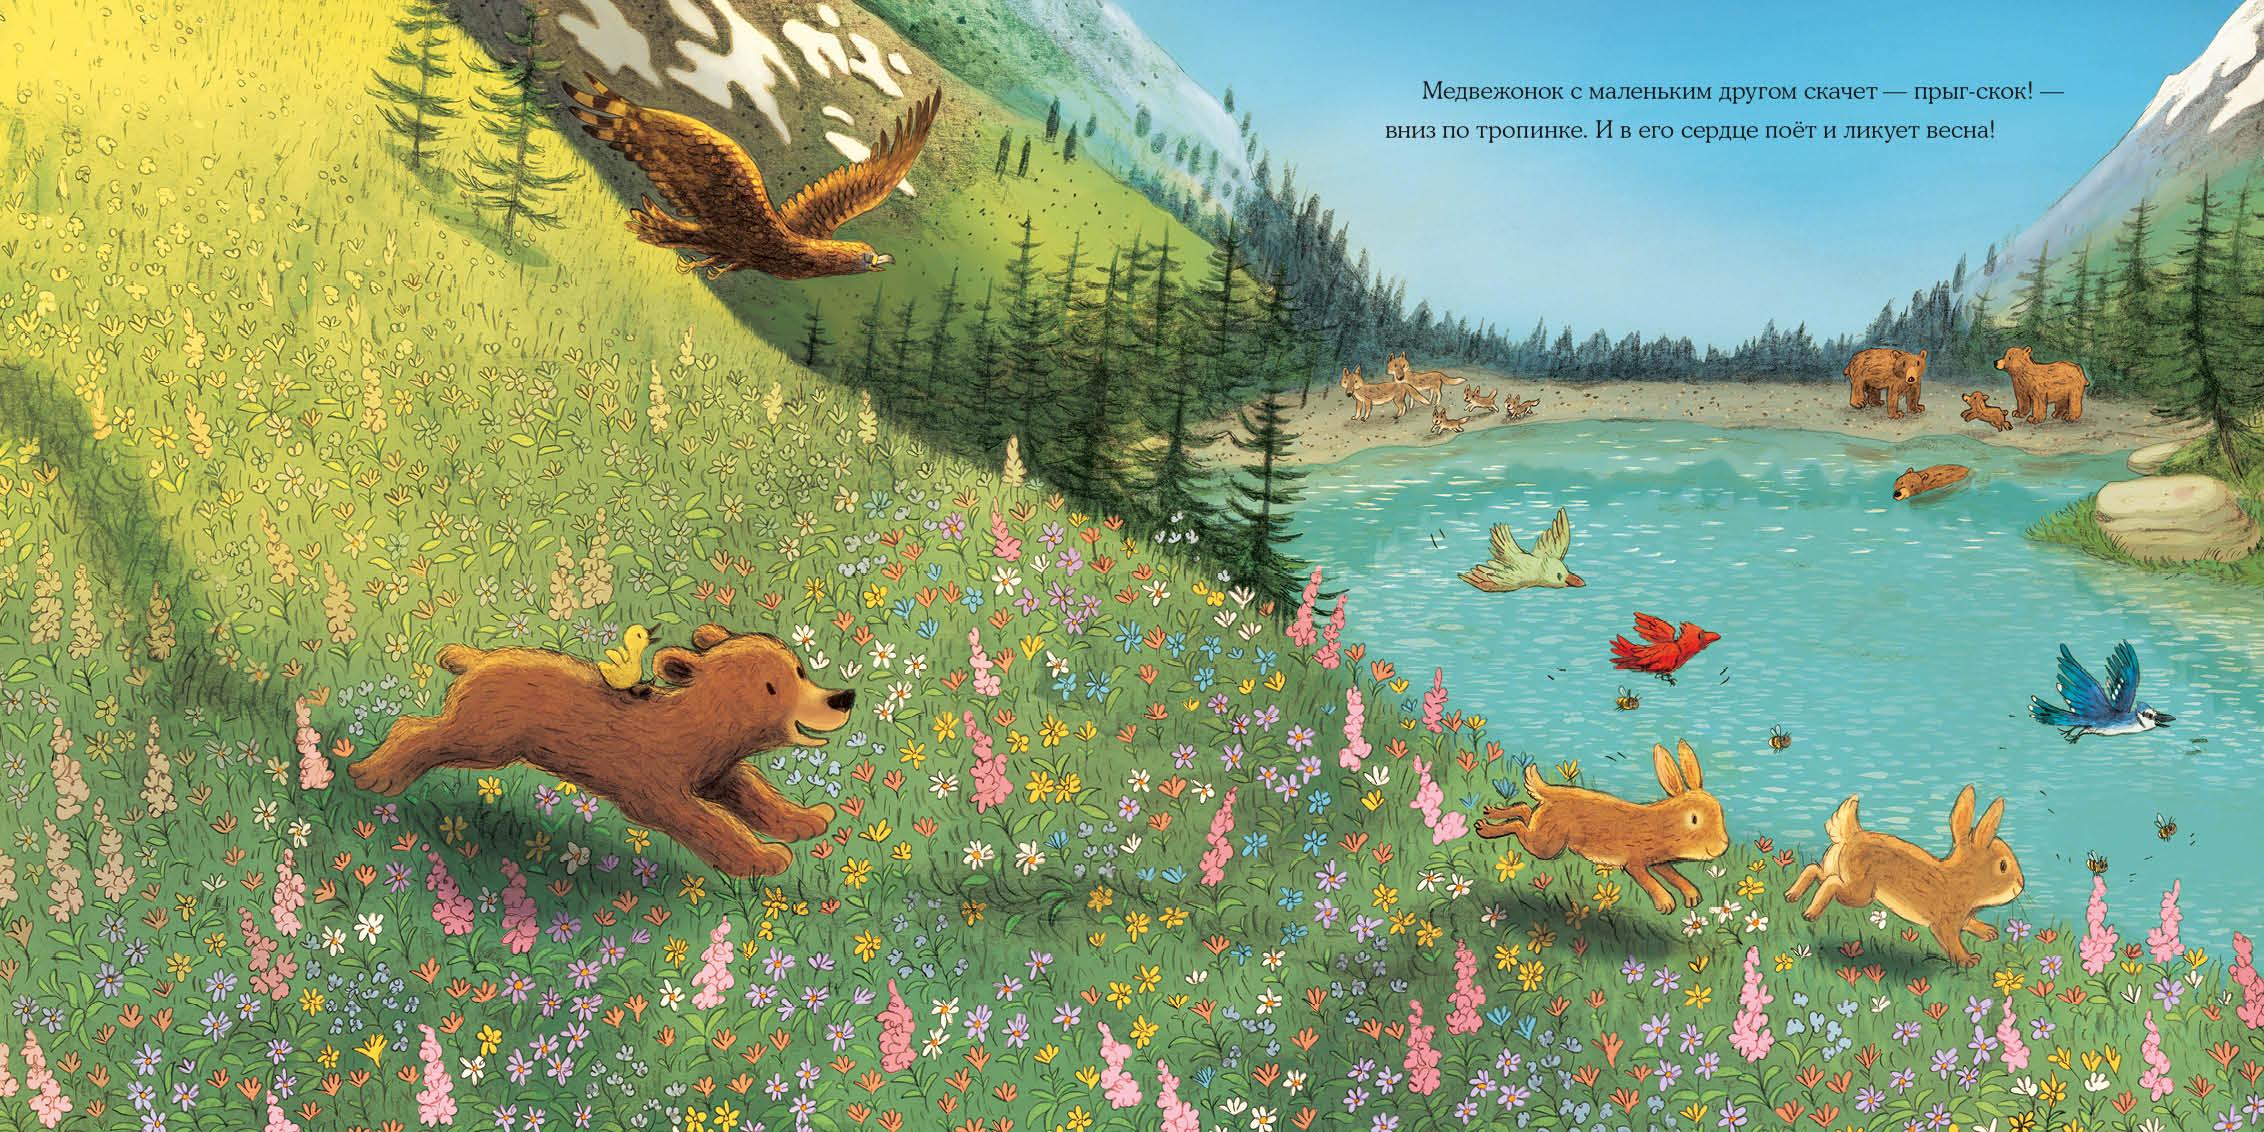 Весна медвежонка